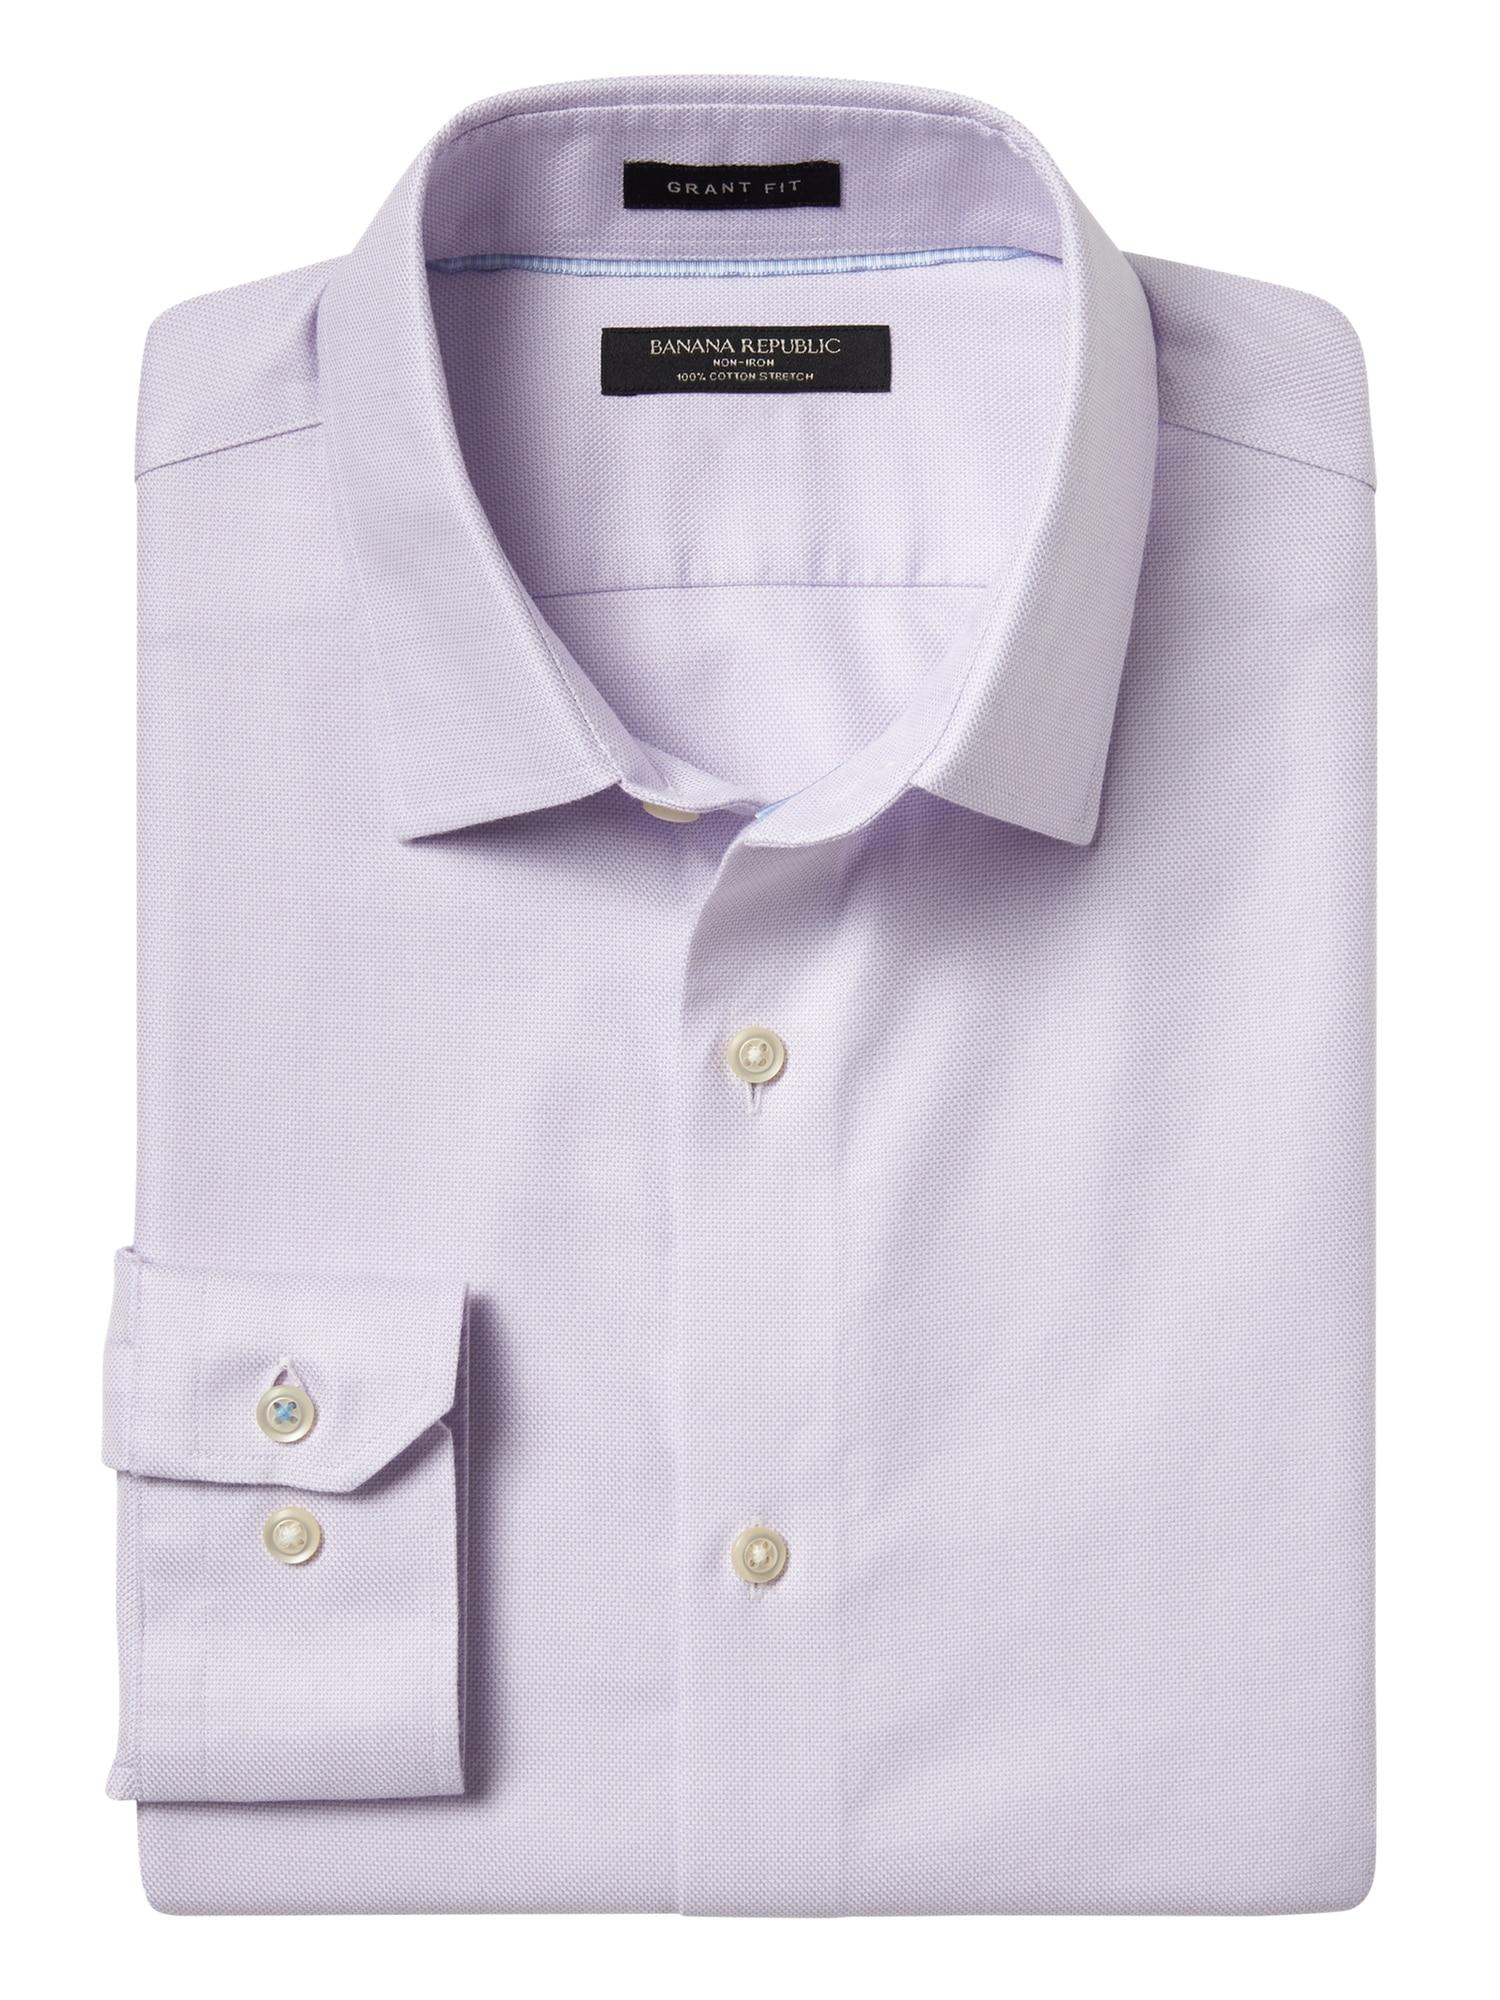 bbc7be87 Grant Slim-Fit Non-Iron Dress Shirt | Banana Republic